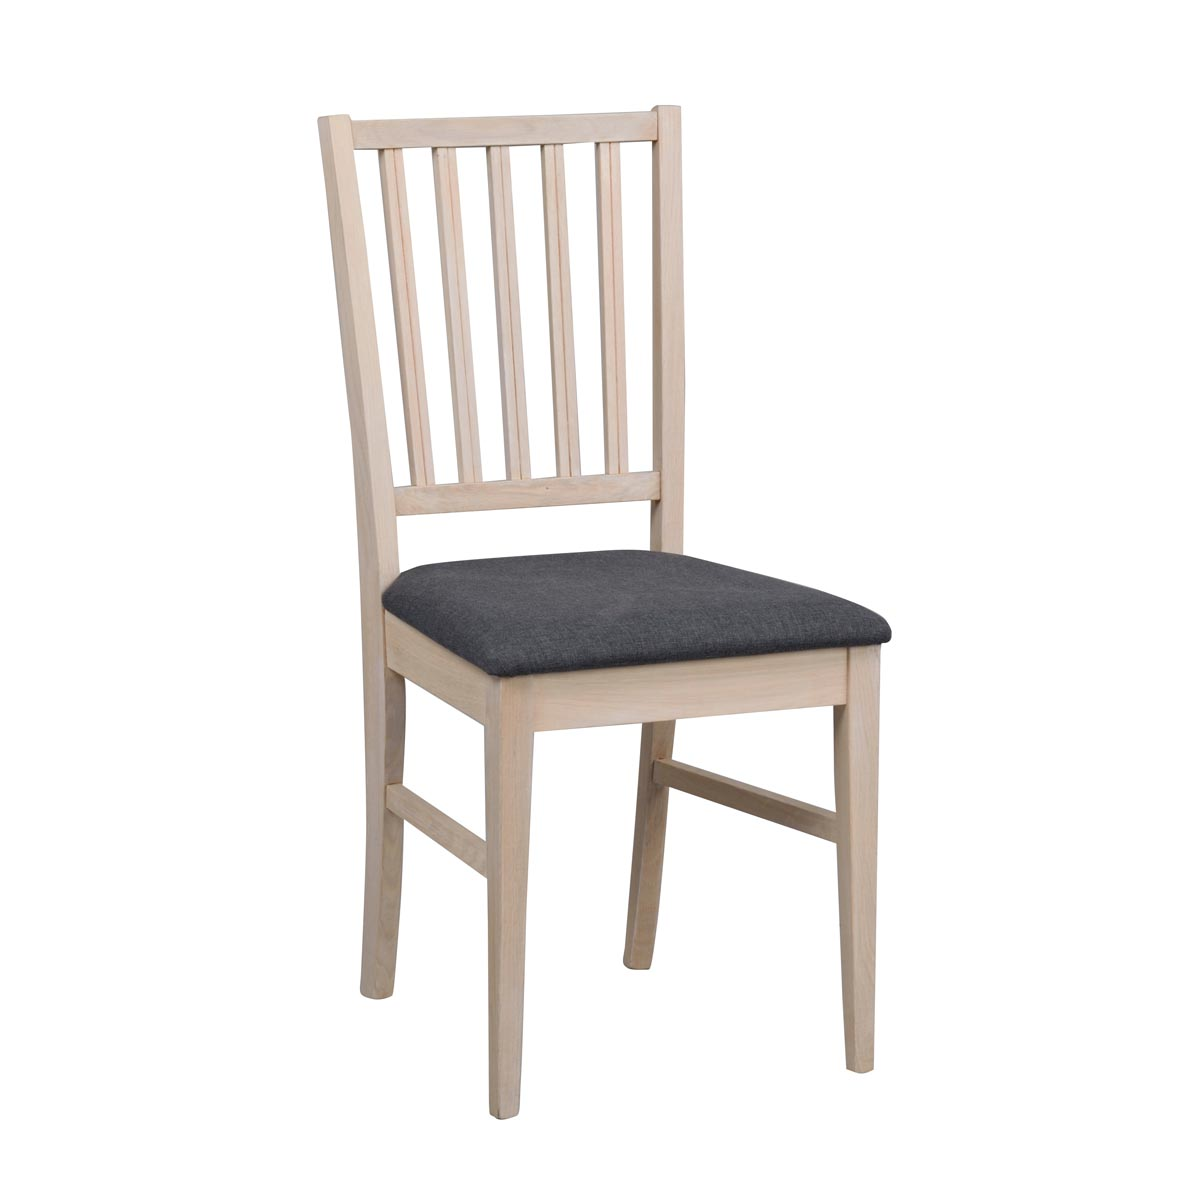 Vasa stol ww grå sits